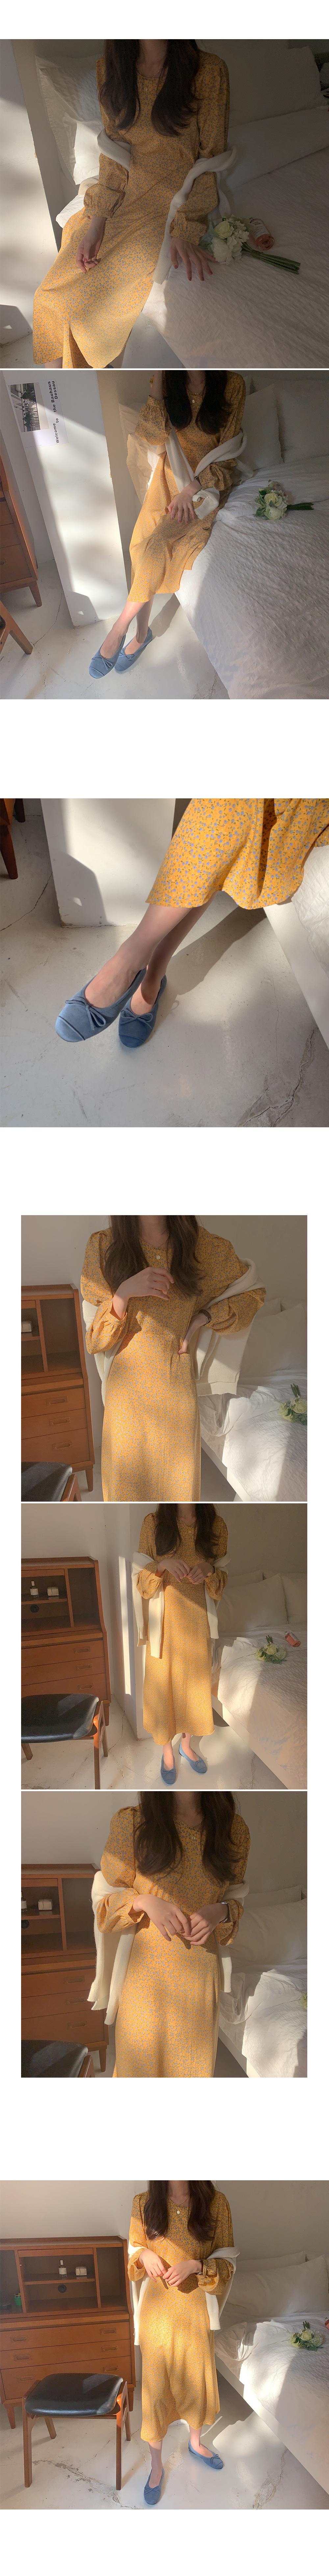 Coaming Wool V Neck Knit